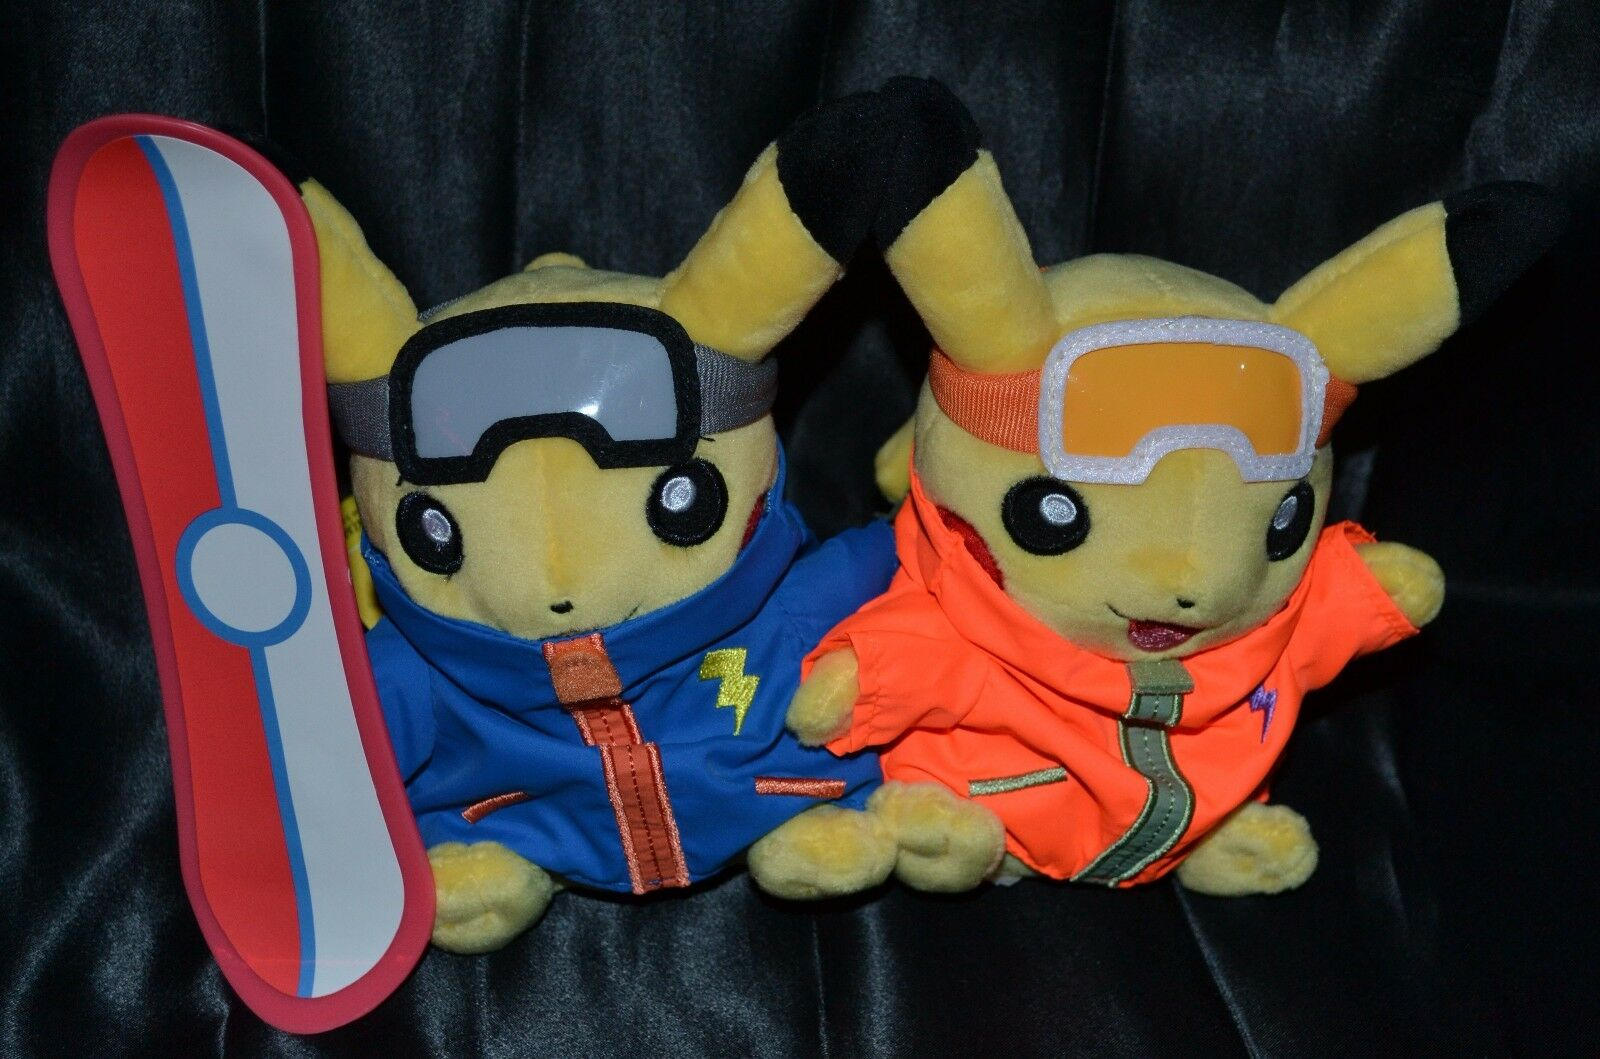 9.5  Paired Pikachu Celebrations  Snowboarder Plush Pokemon Center Dolls Toys